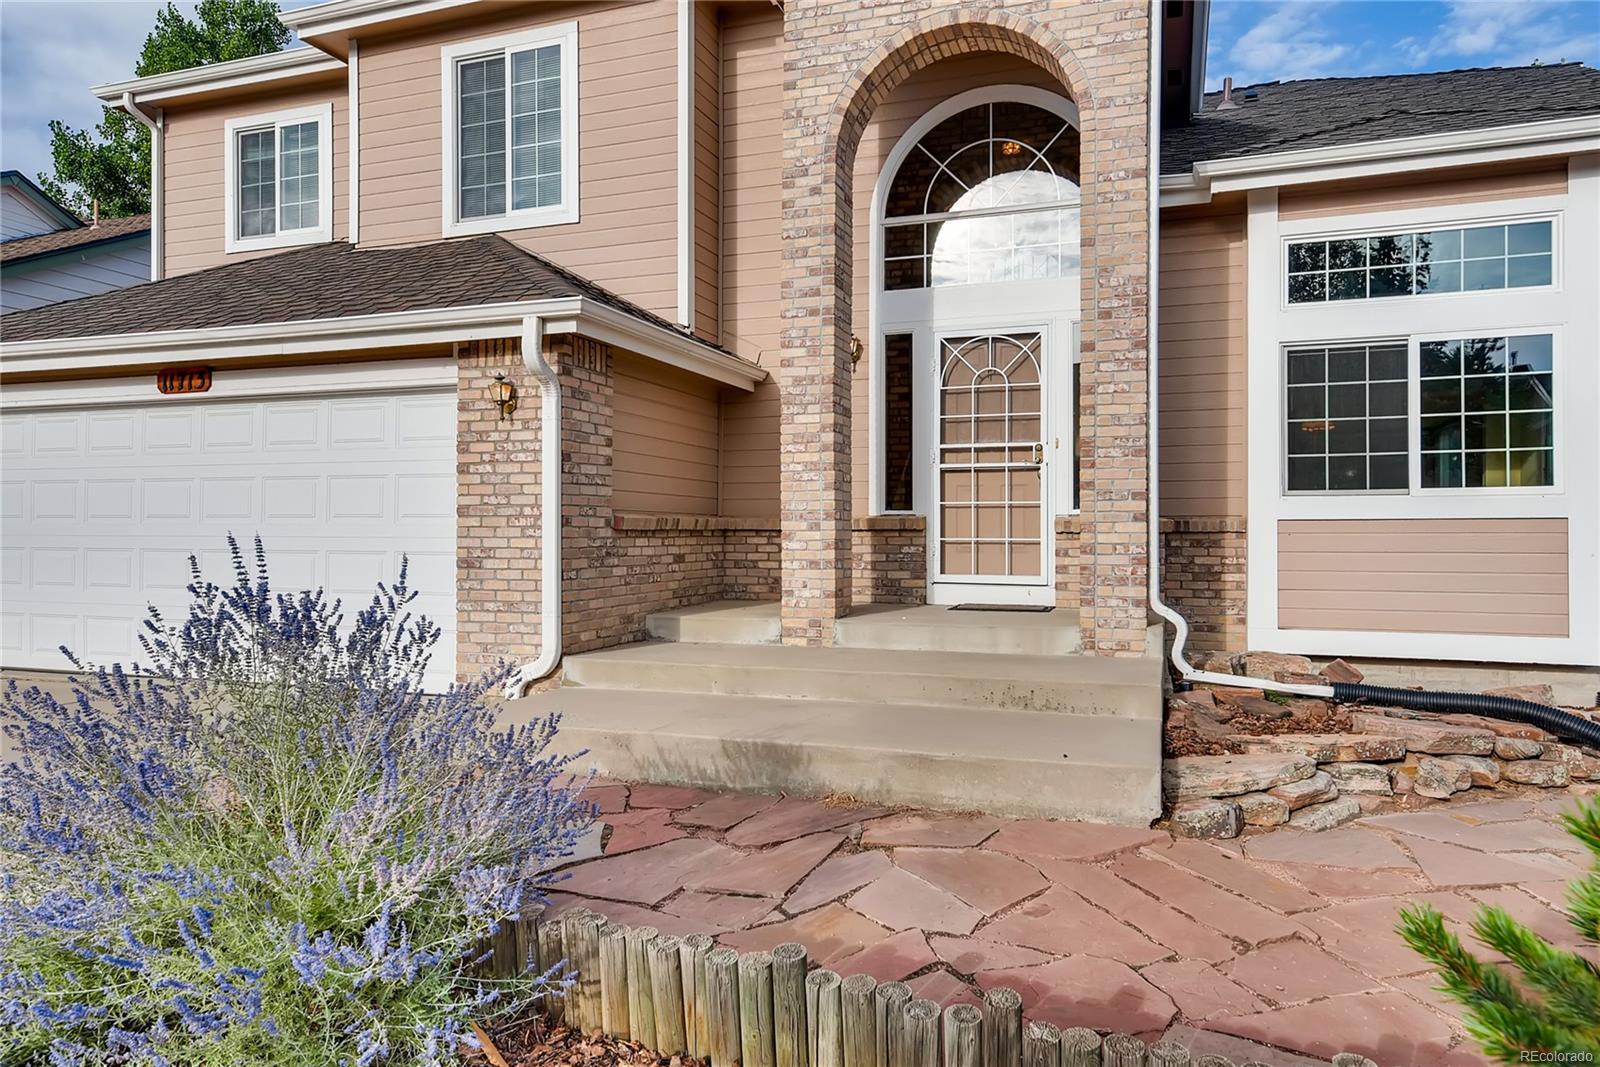 11713 W 56th Circle, Arvada, CO 80002 - Arvada, CO real estate listing